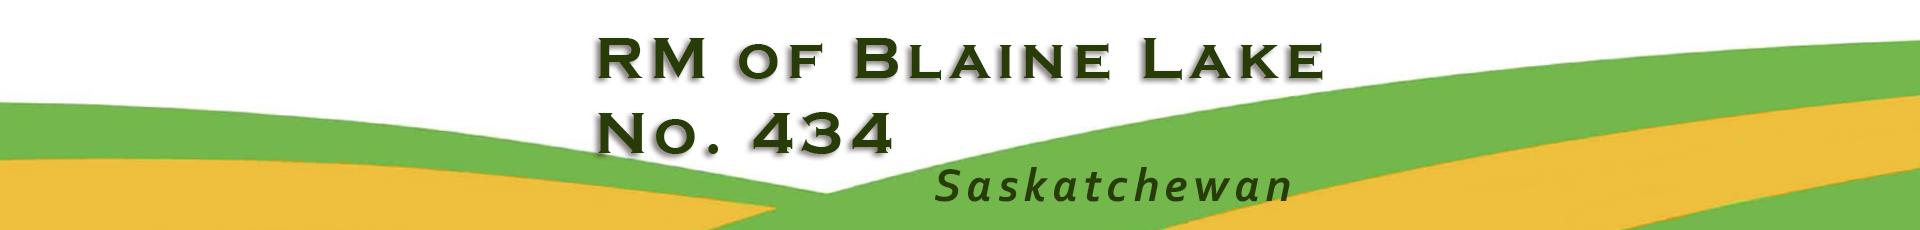 RM of Blaine Lake